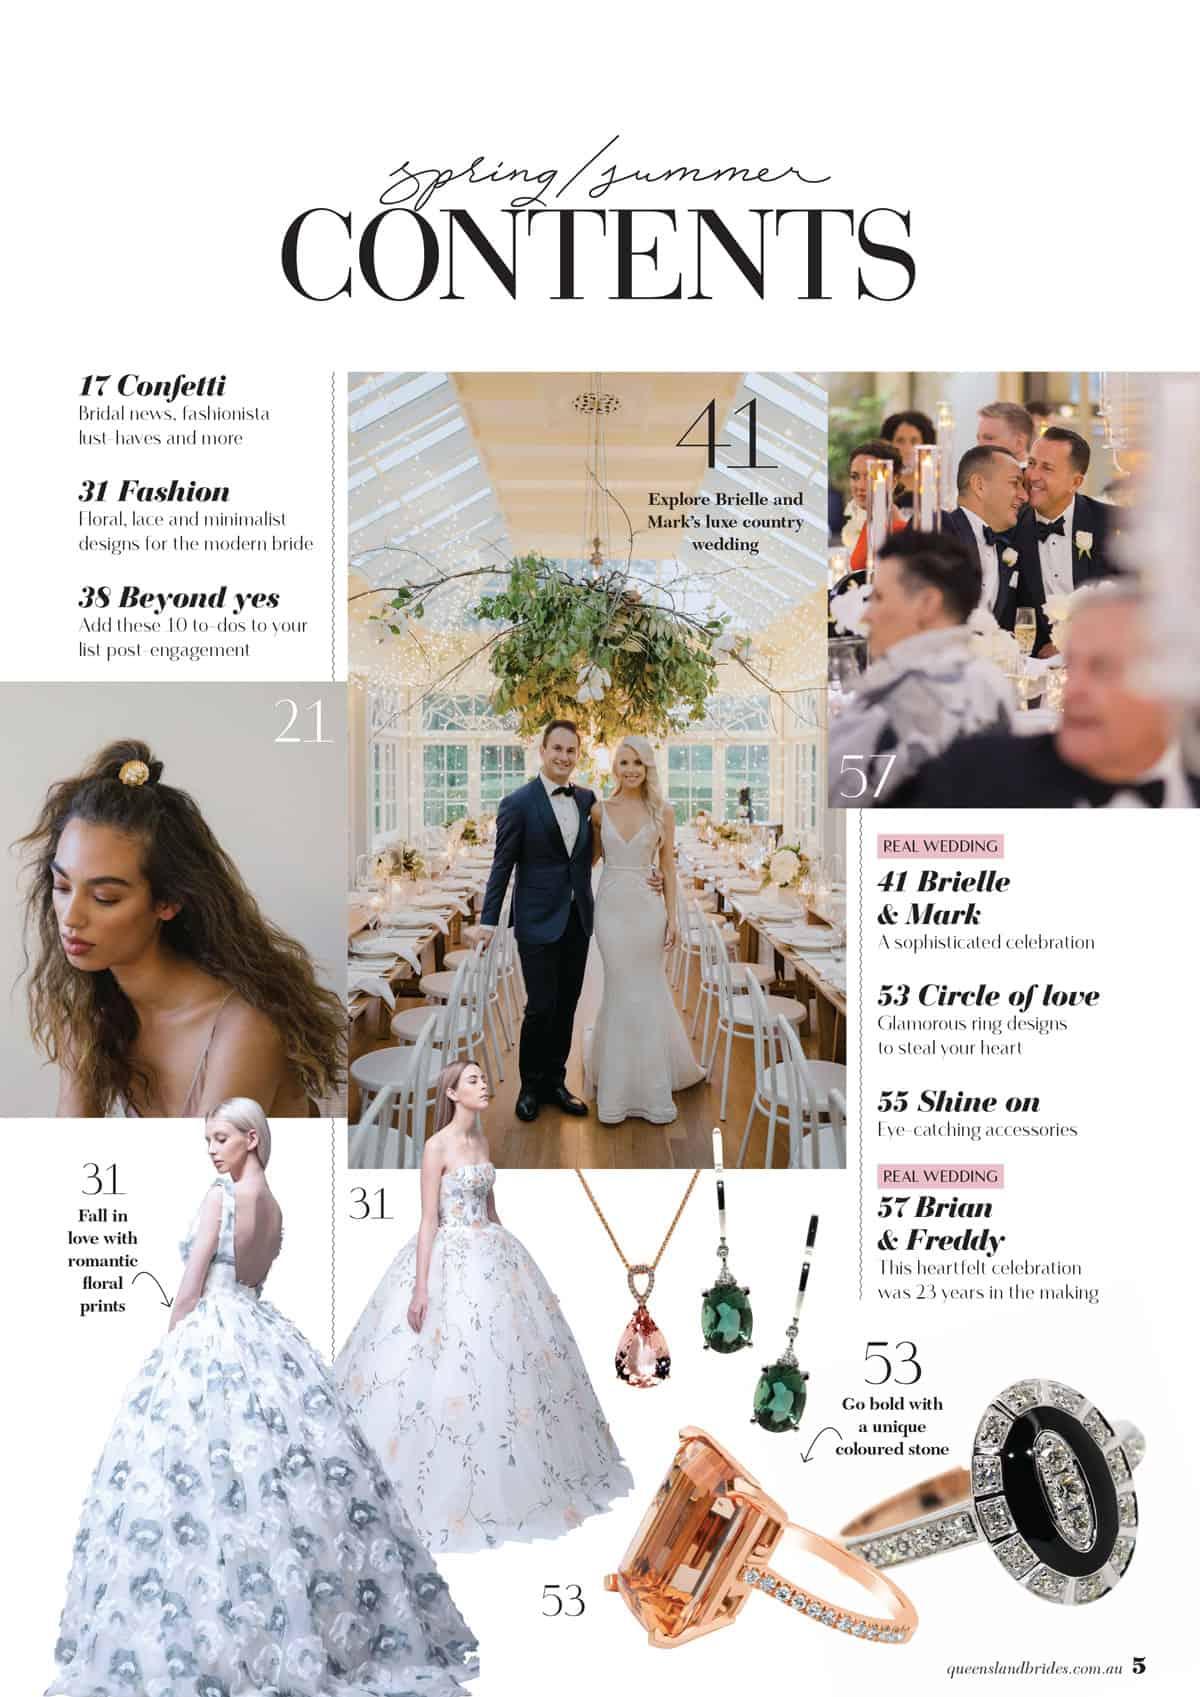 Queensland Brides Spring / Summer 2019 edition